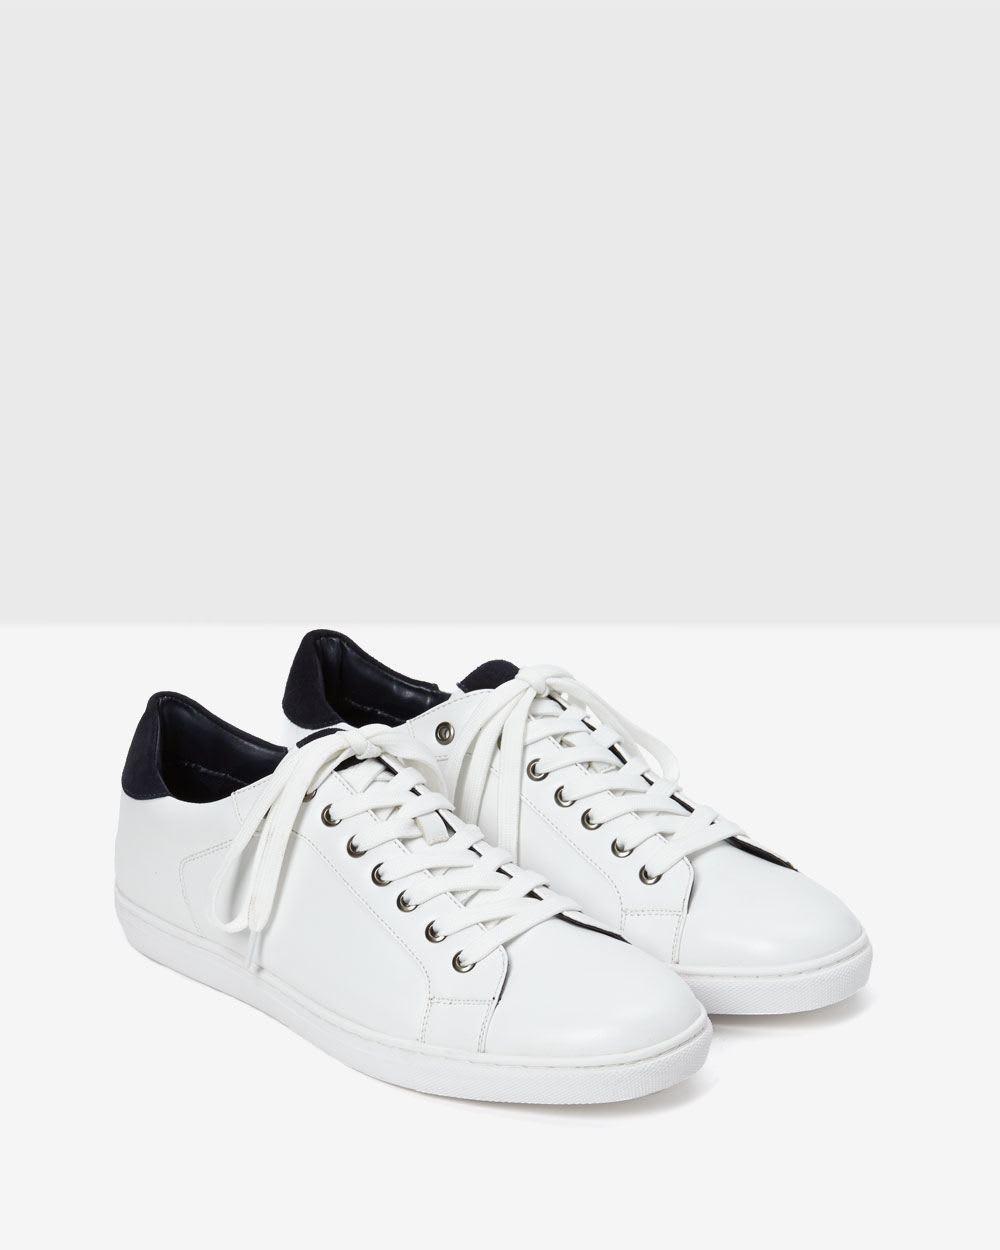 3870a84ab Men's White Sneaker | RW&CO.